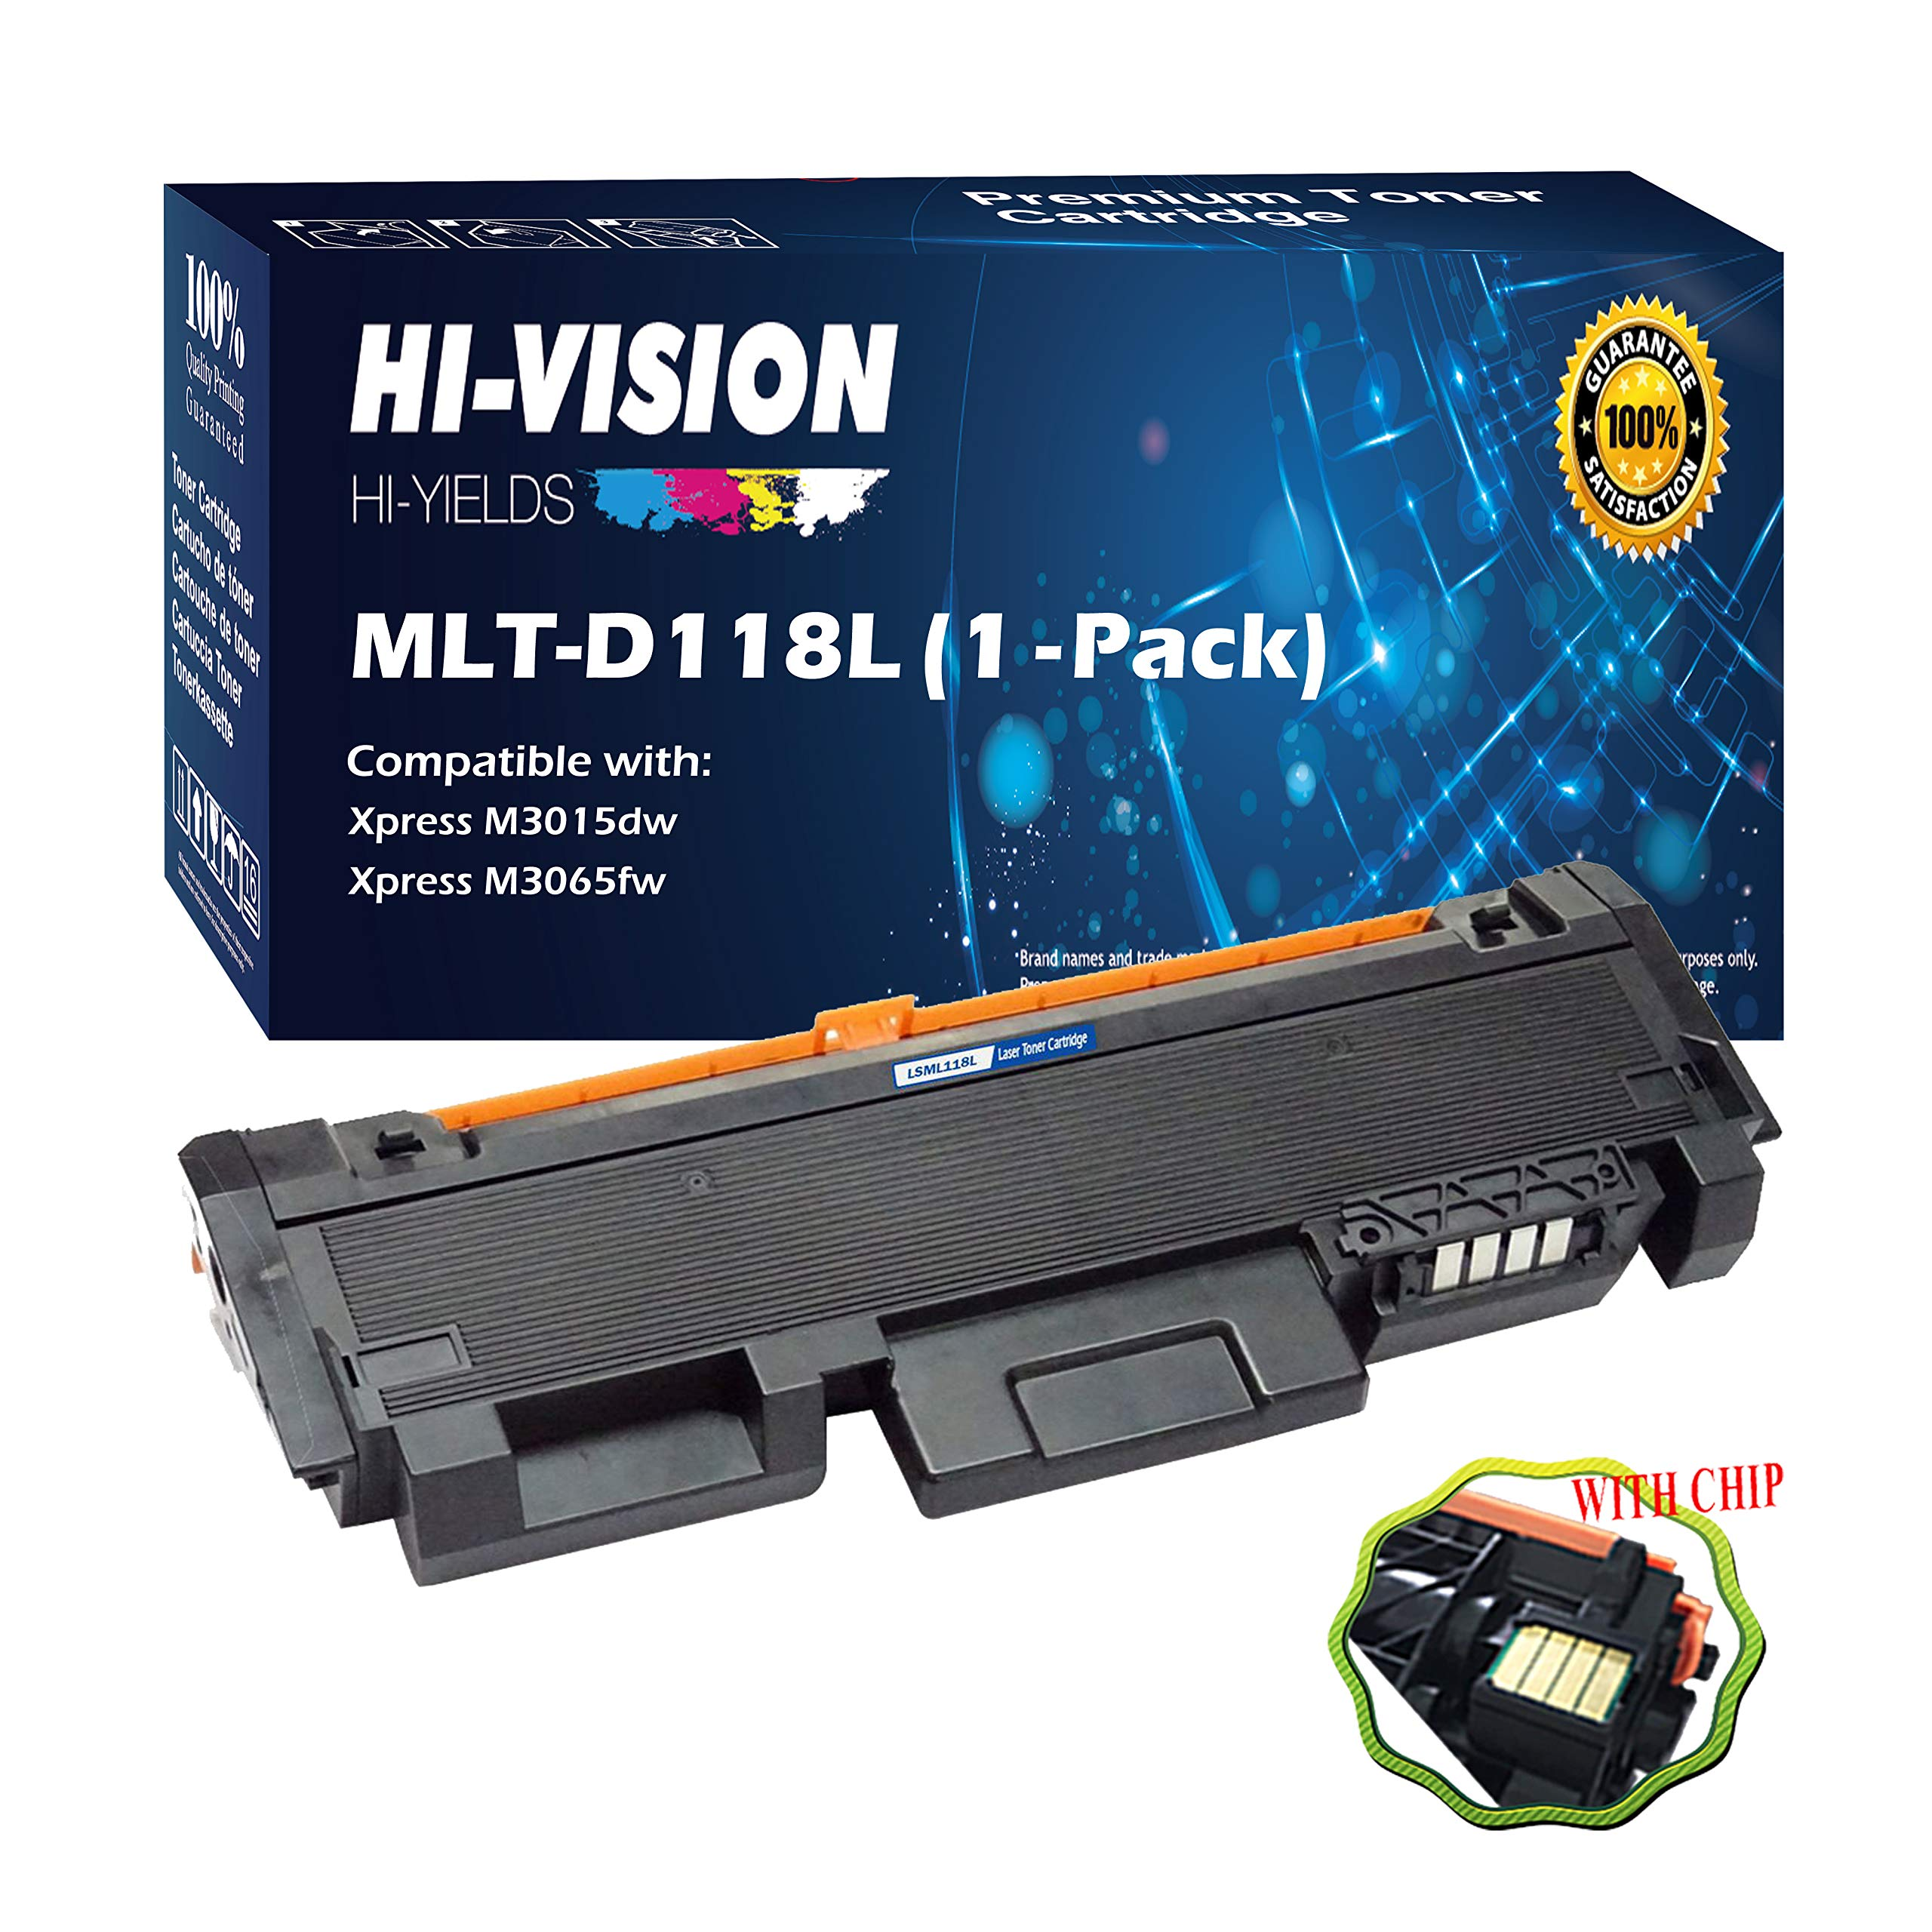 PayForLess Toner Cartridge MLT-D118L D118L D118S XAA Black 2PK Compatible for Samsung Xpress M3015DW M3065FW Printers